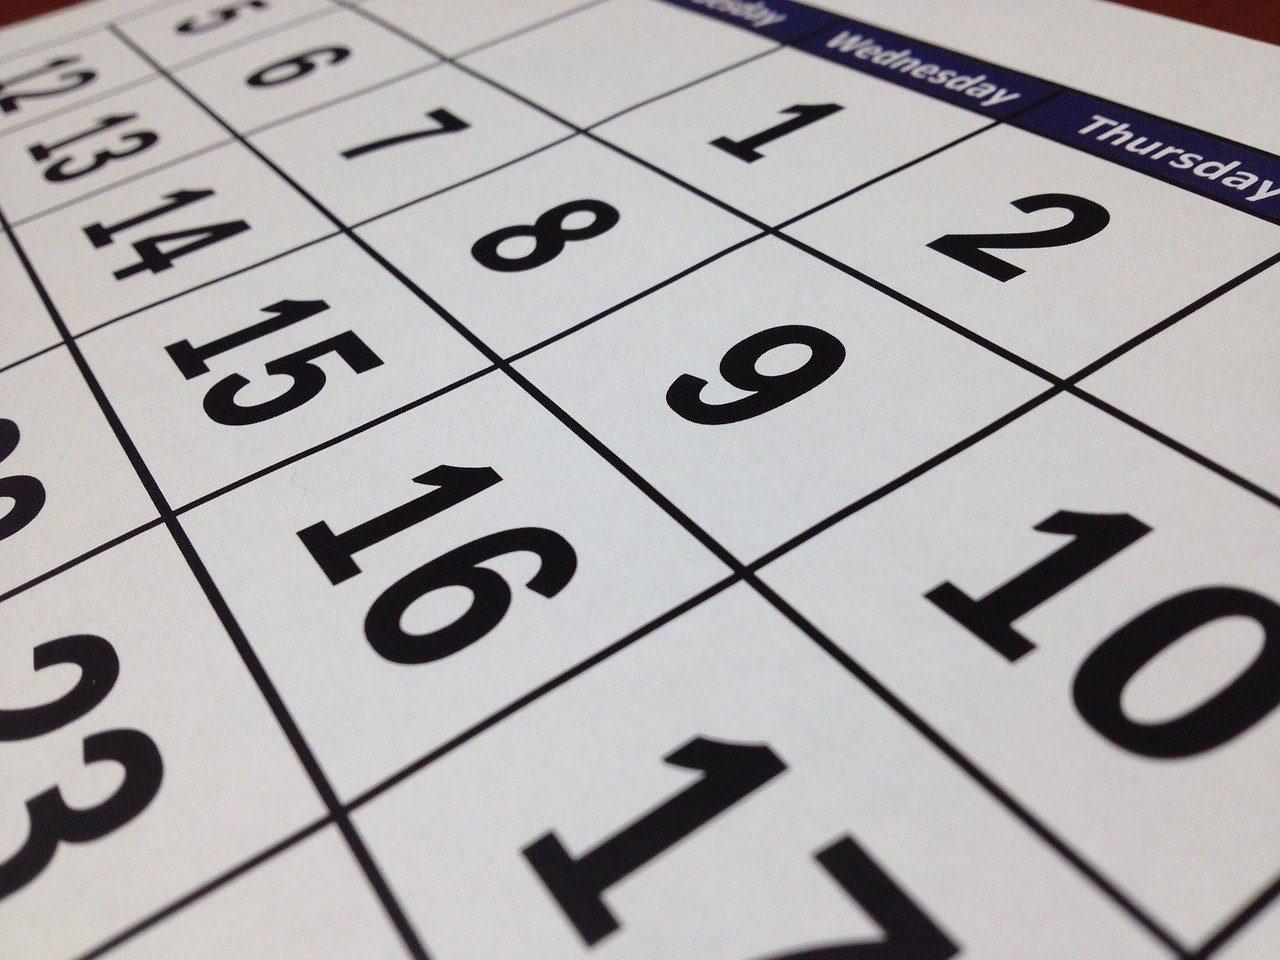 Close up shot of a calendar